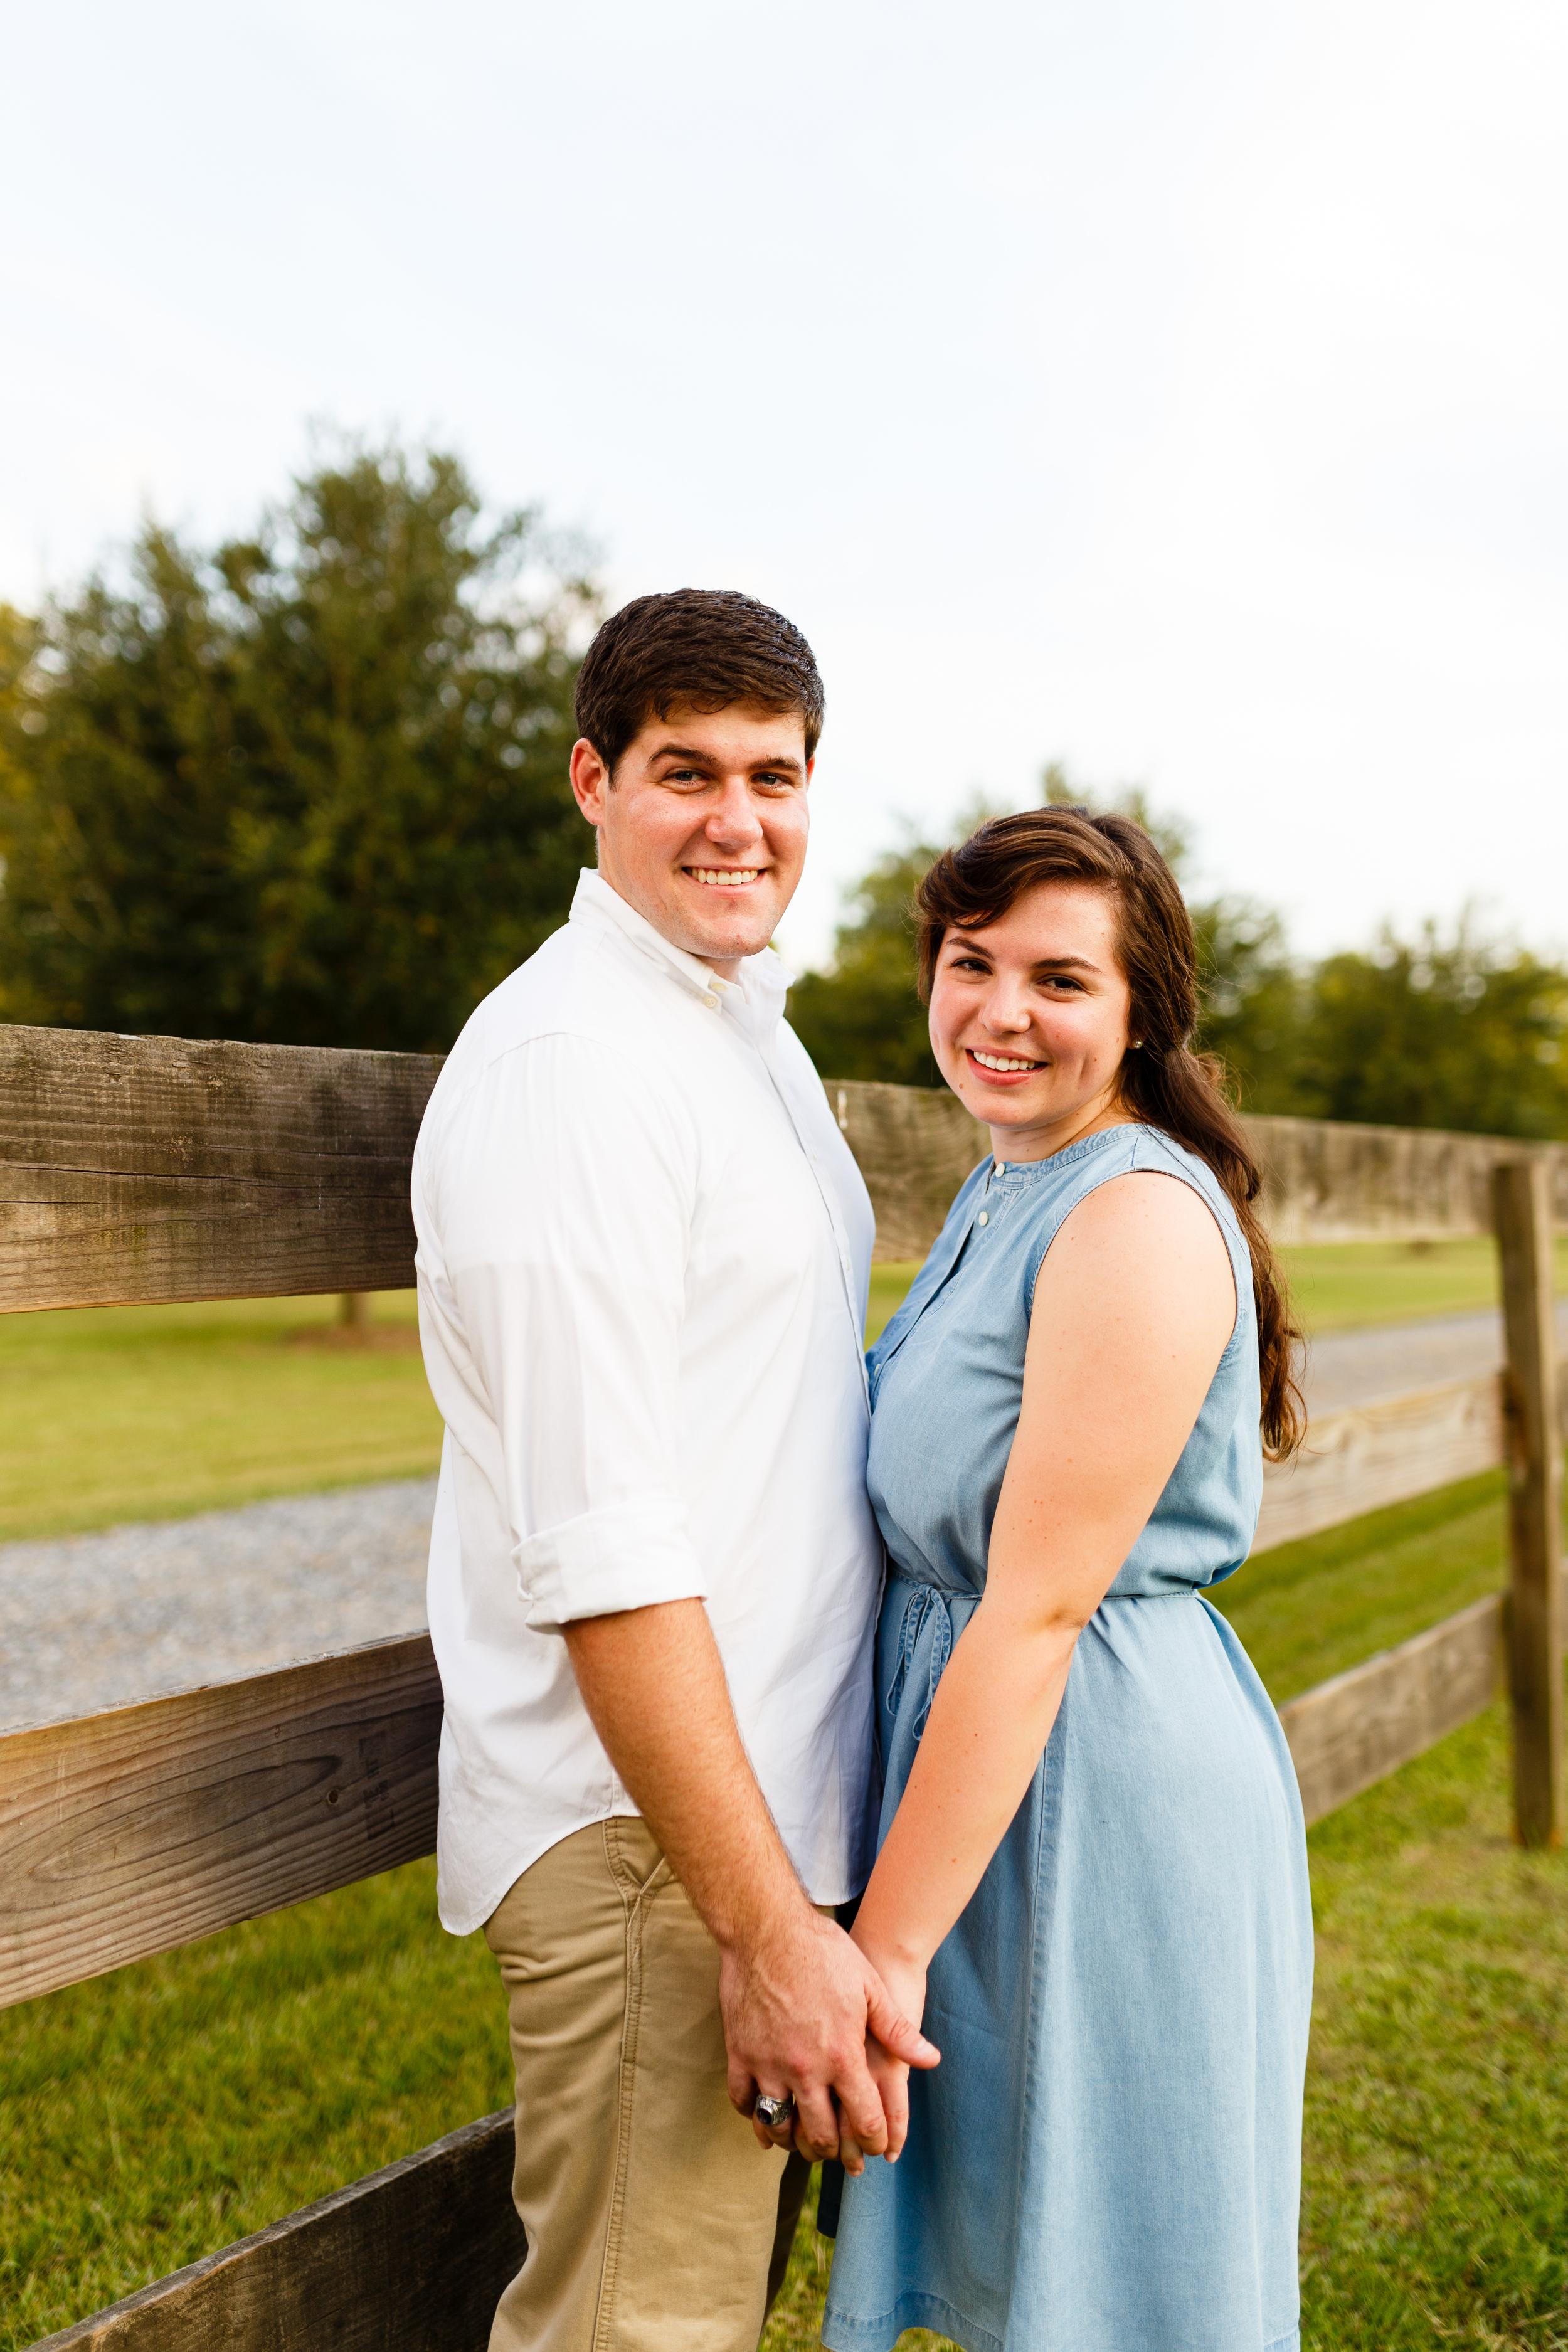 Engagement-portrait-lafayette-broussard-youngsville-photographer-18.jpg